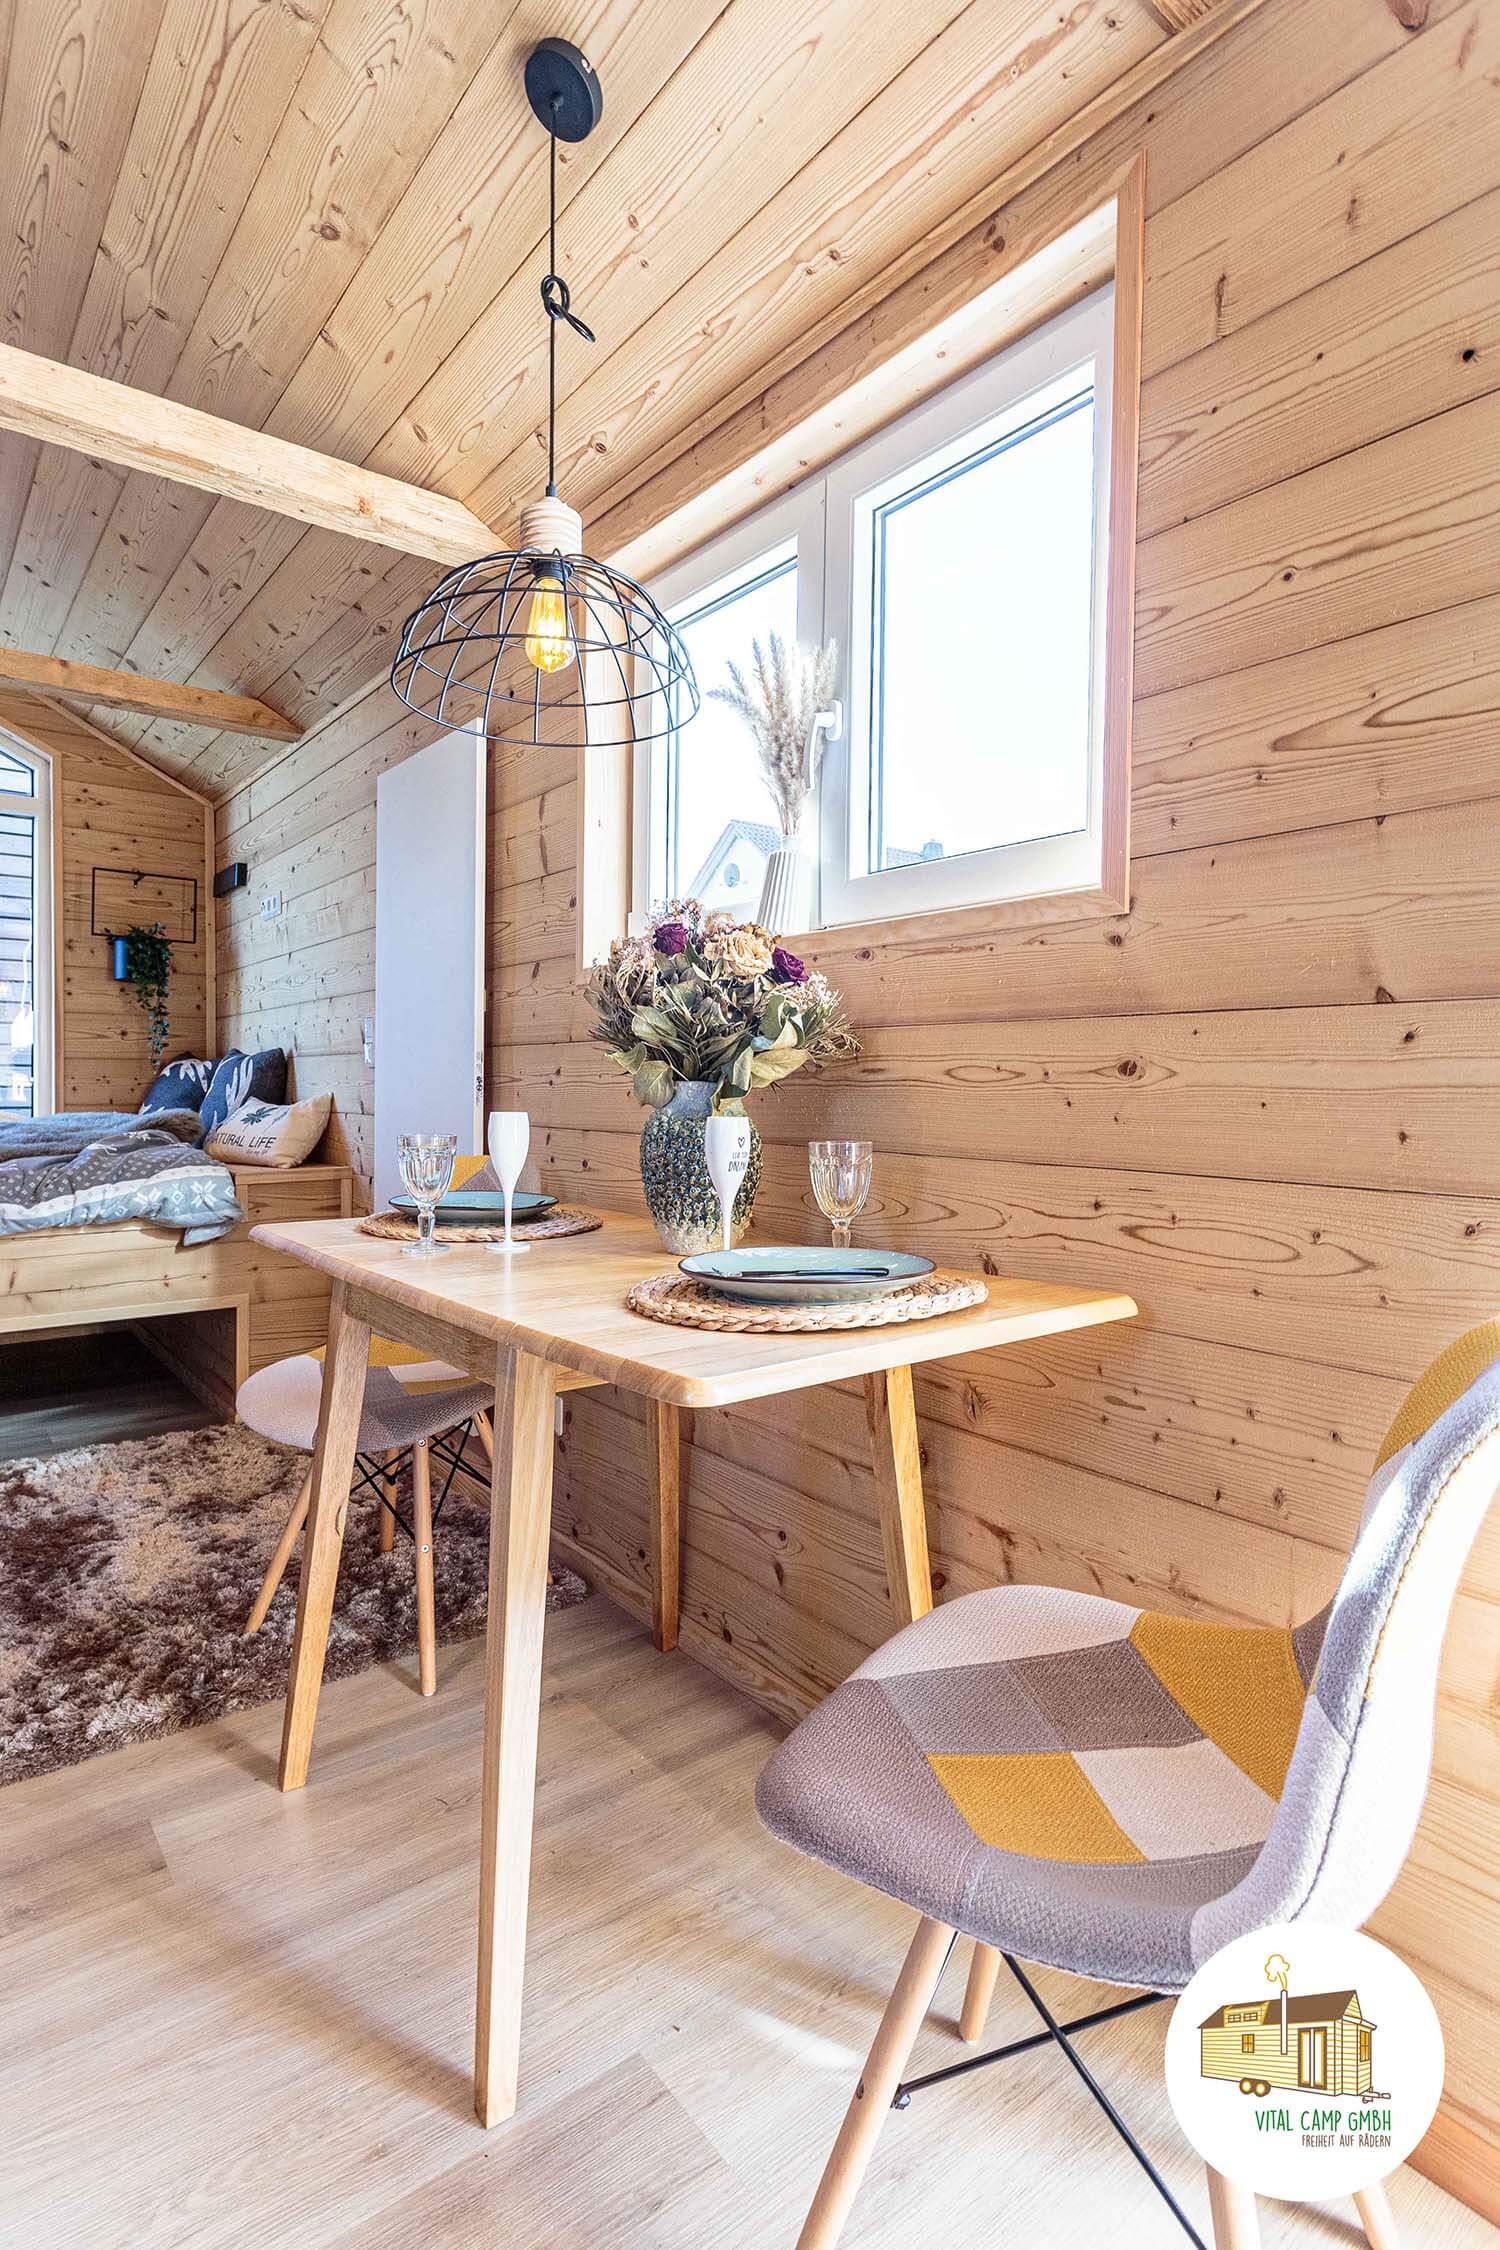 mobiles-chalet-finnland-vital-camp-gmbh-24